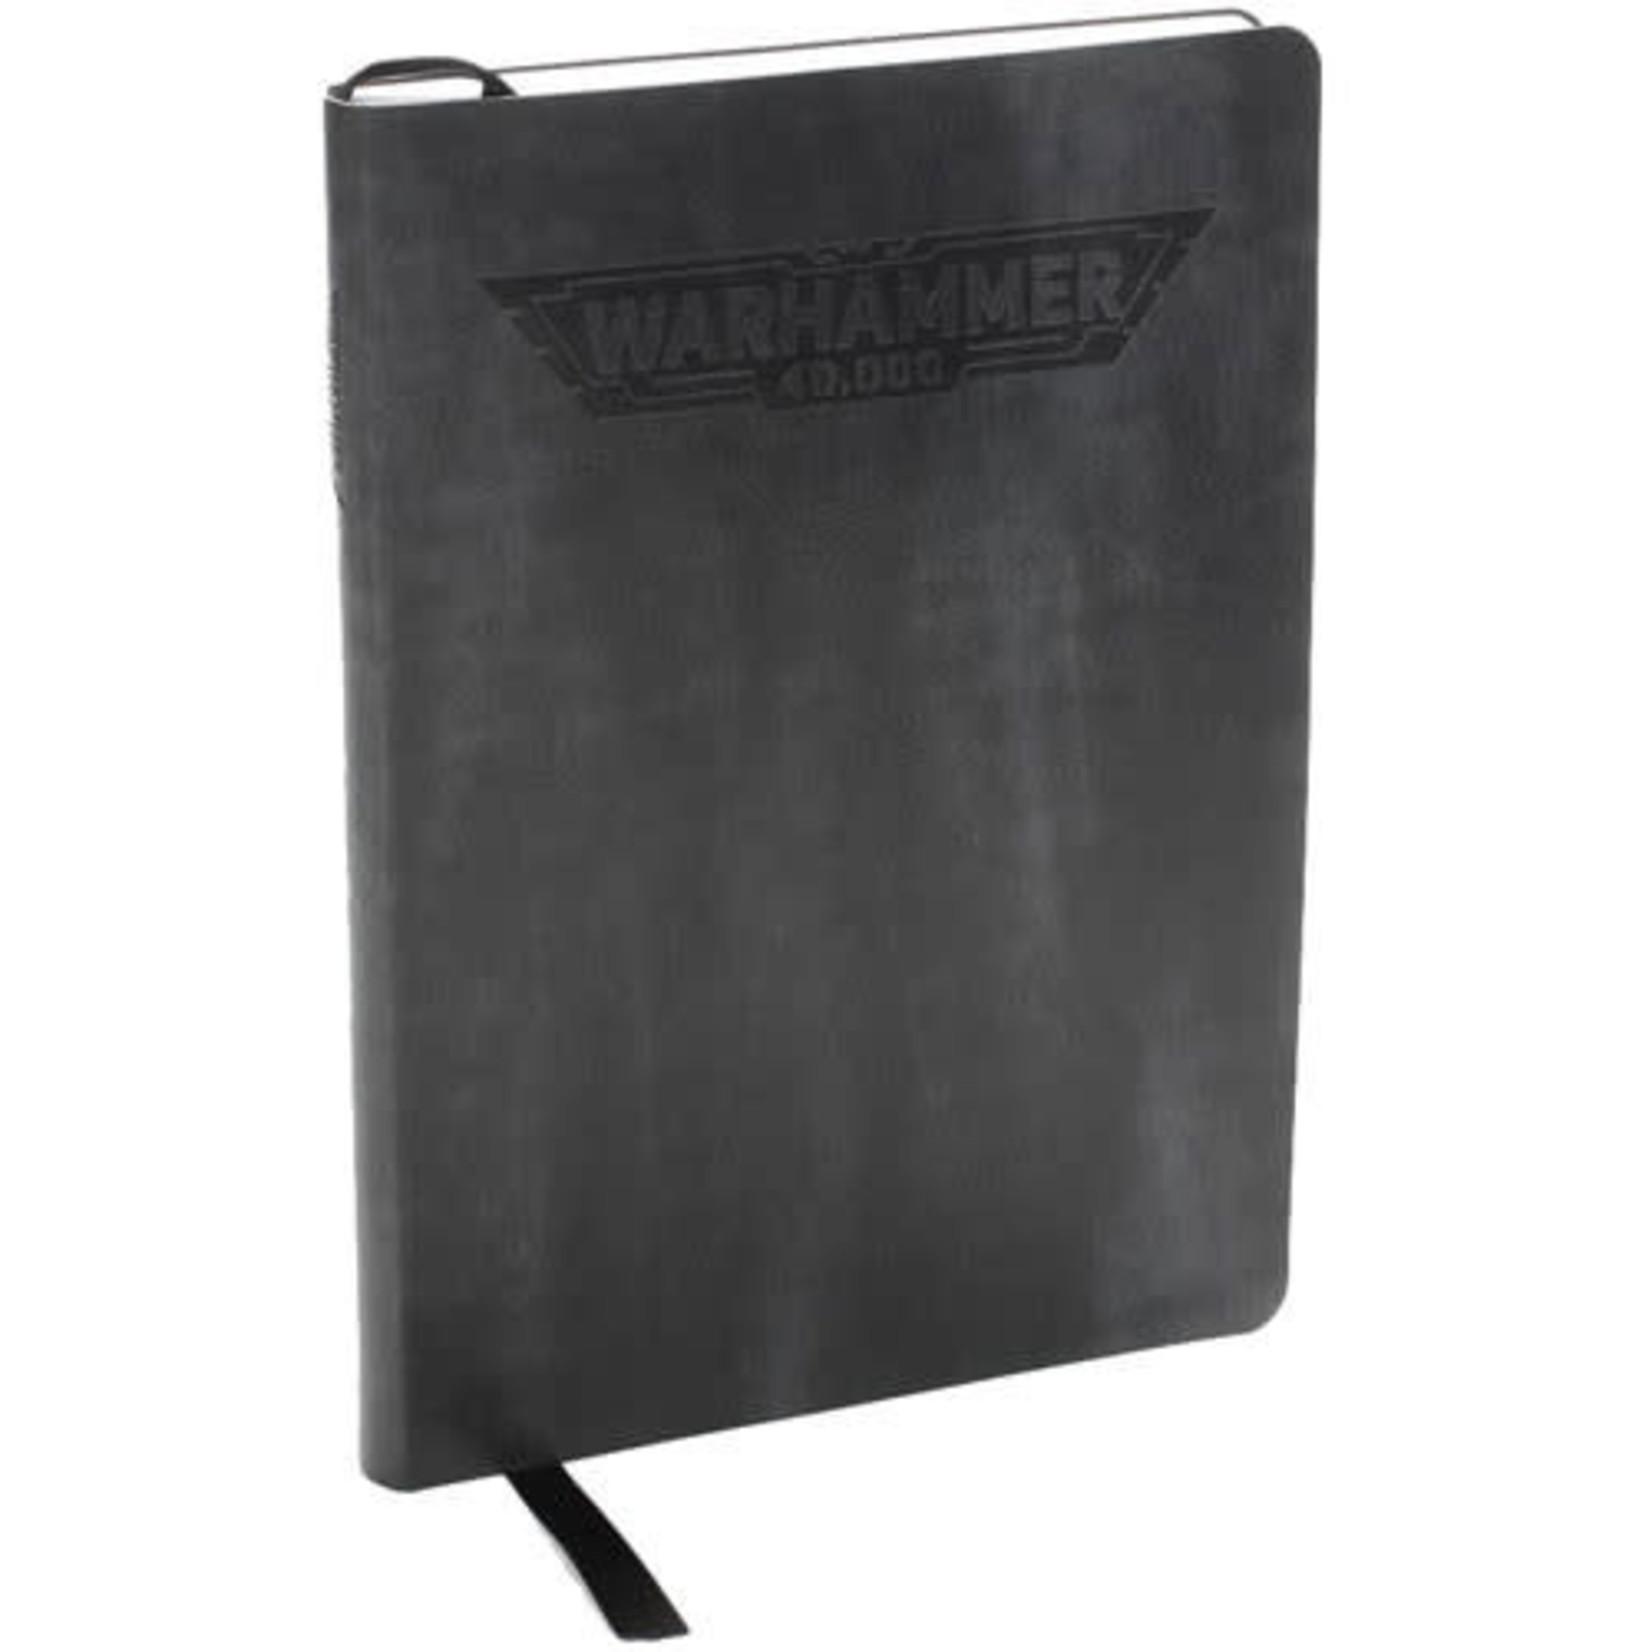 Games Workshop Crusade Journal 9th Edition (40K)